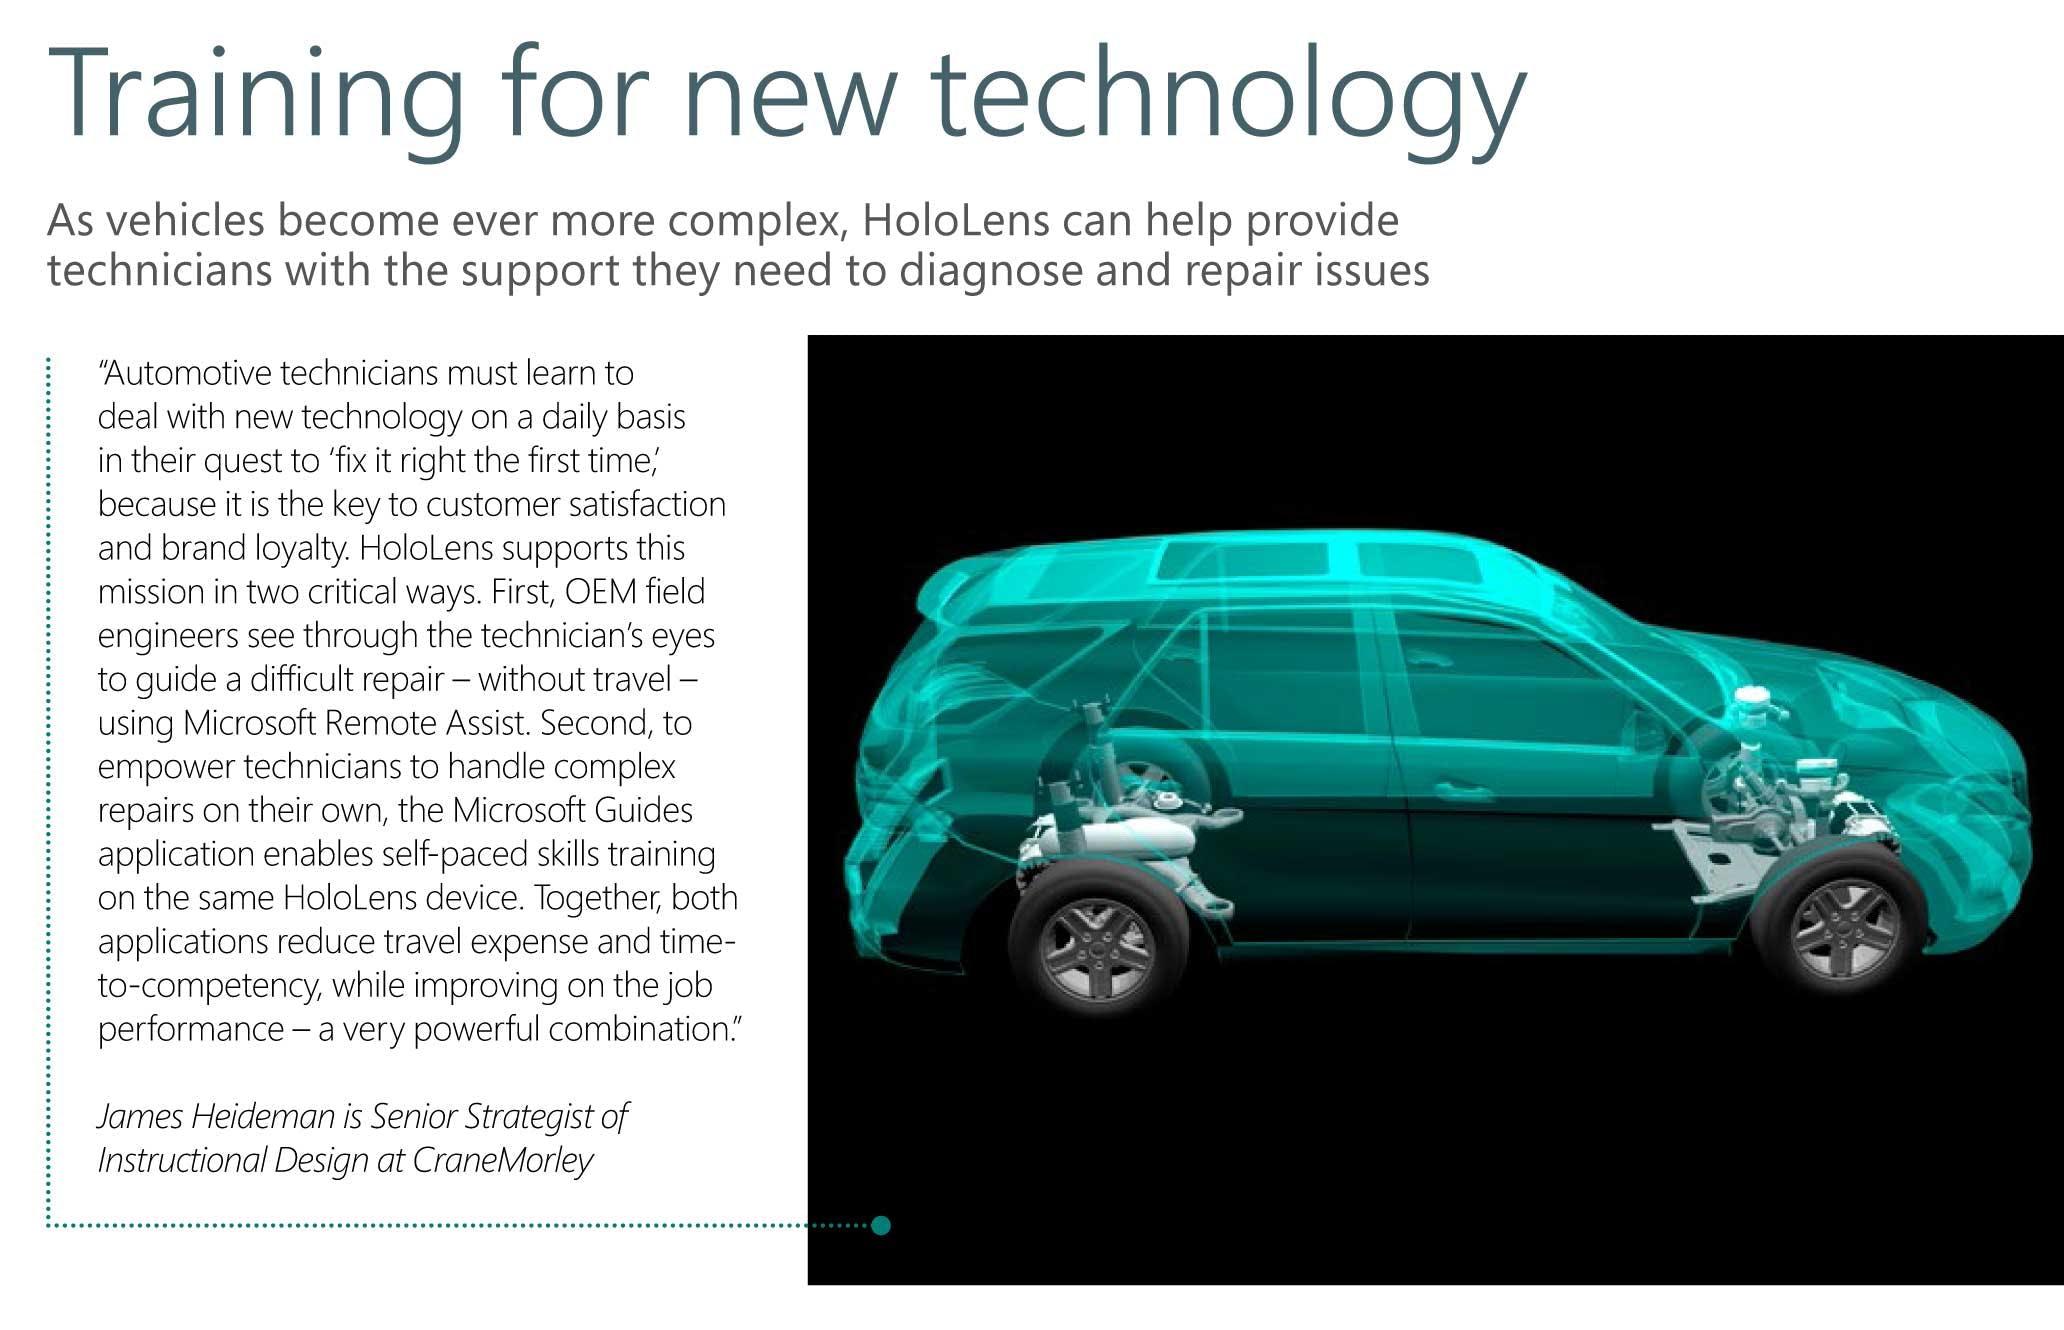 The Record Magazine magazine cut out on Senior Strategist of Instuctional Design James Heideman on the training use of Microsoft HoloLens 2.